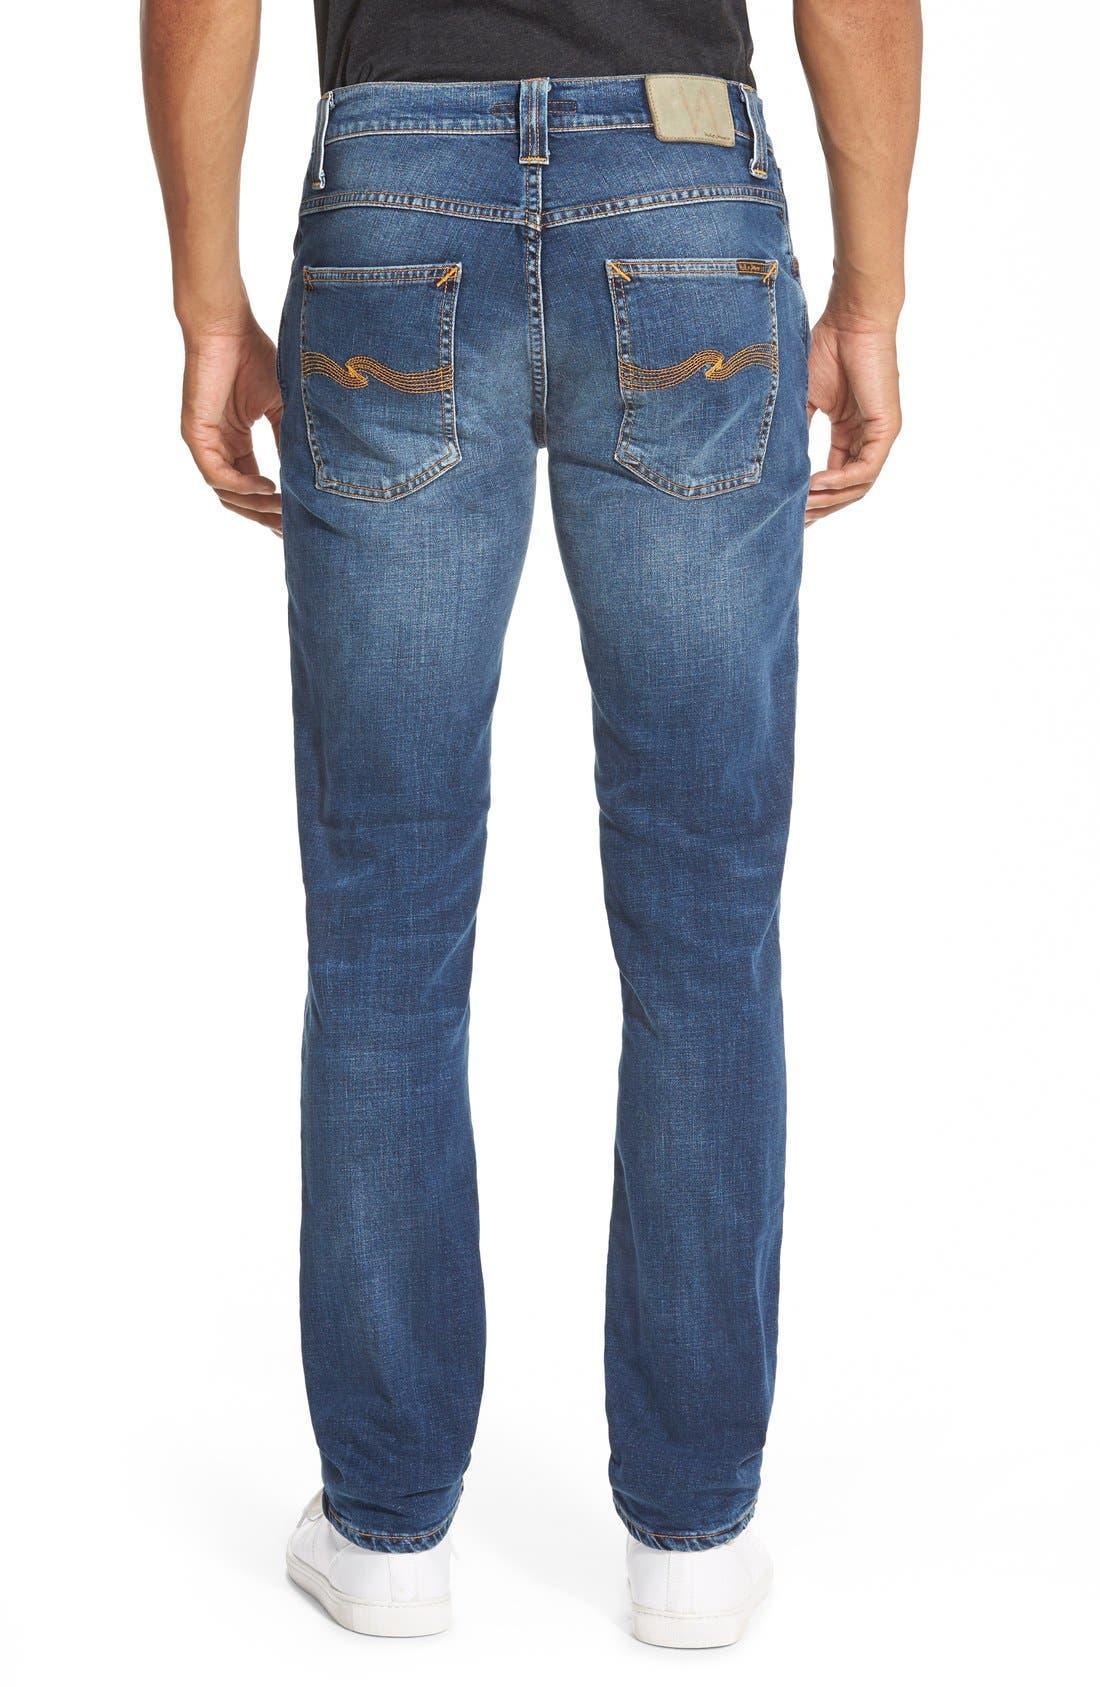 NUDIE JEANS,                             'Grim Tim' Slim Fit Stretch Organic Cotton Jeans,                             Alternate thumbnail 3, color,                             462